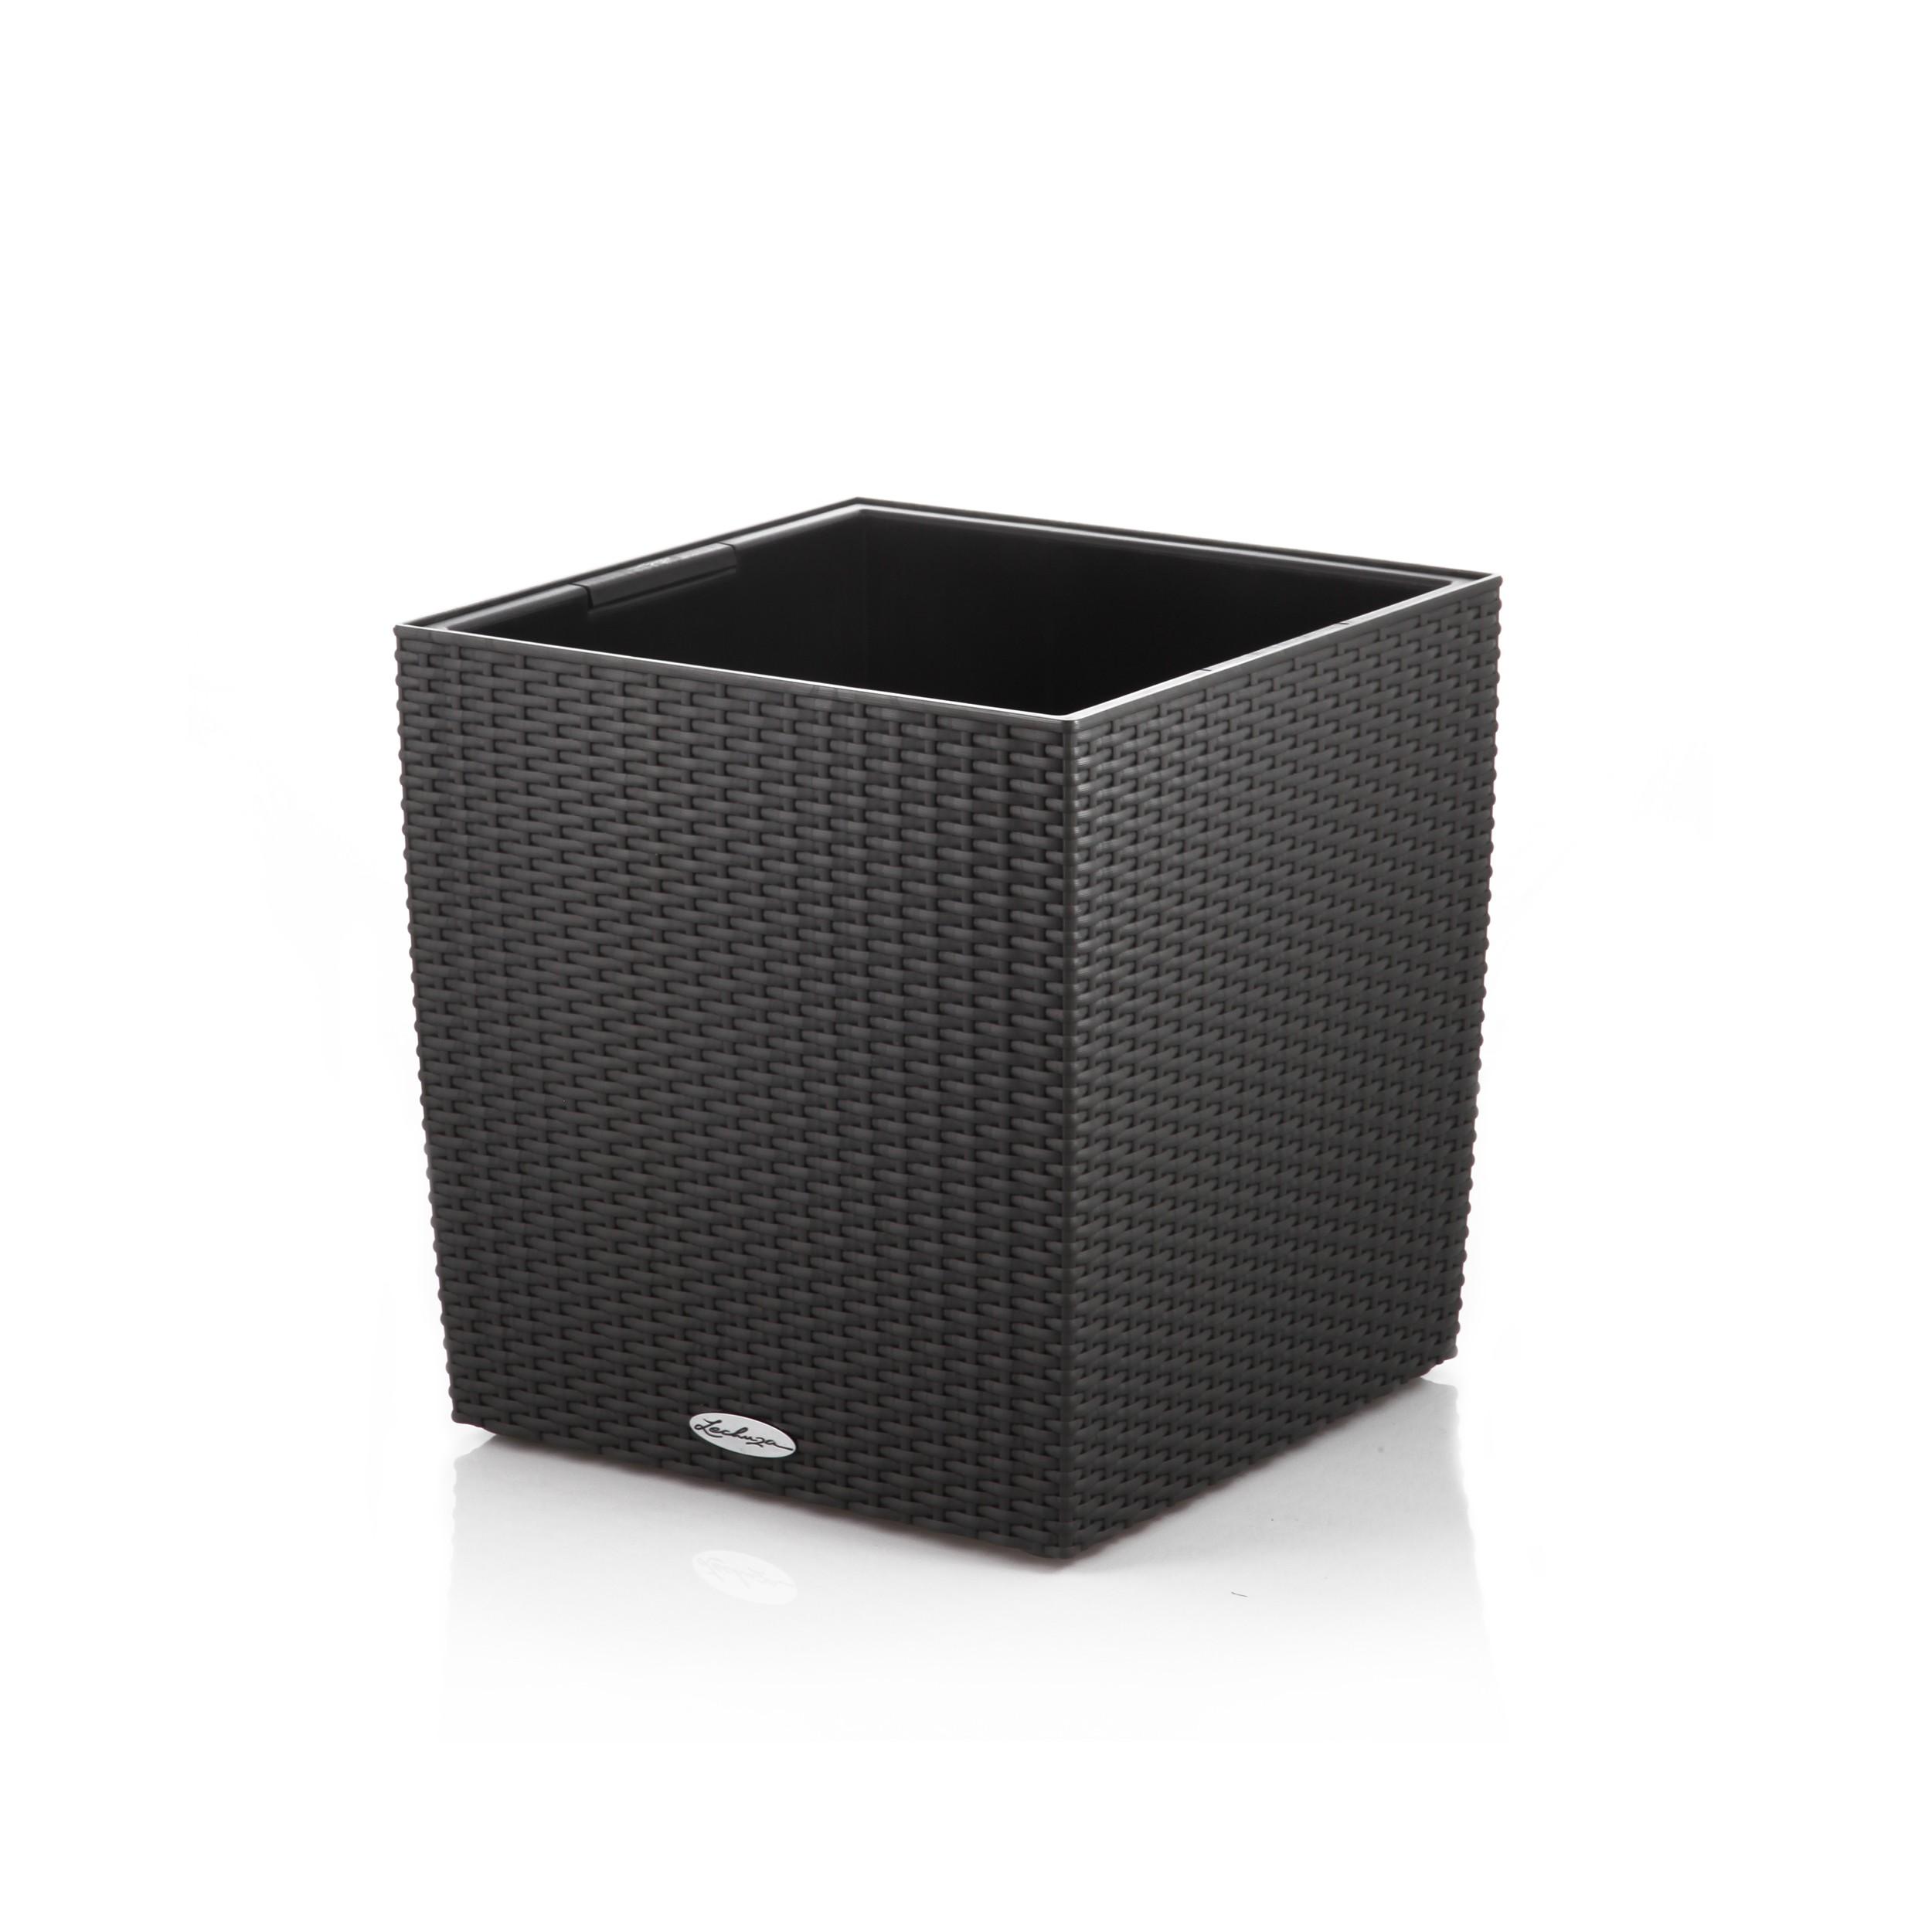 lechuza cube cottage 30 komplett set pflanzgef. Black Bedroom Furniture Sets. Home Design Ideas